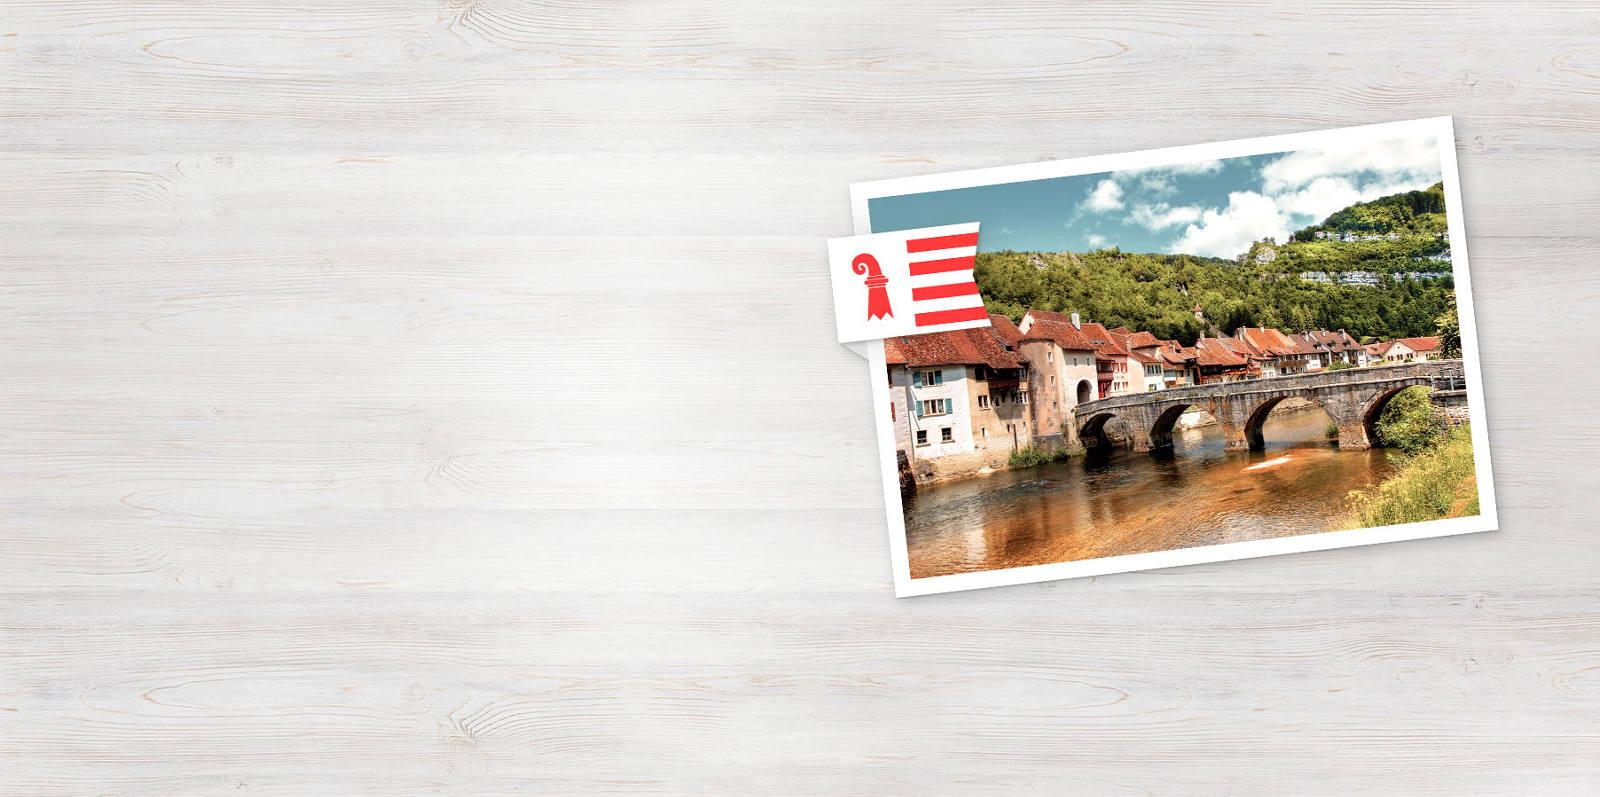 Albergo Diffuso Porrentruy, Porrentruy | Jura Tourismus